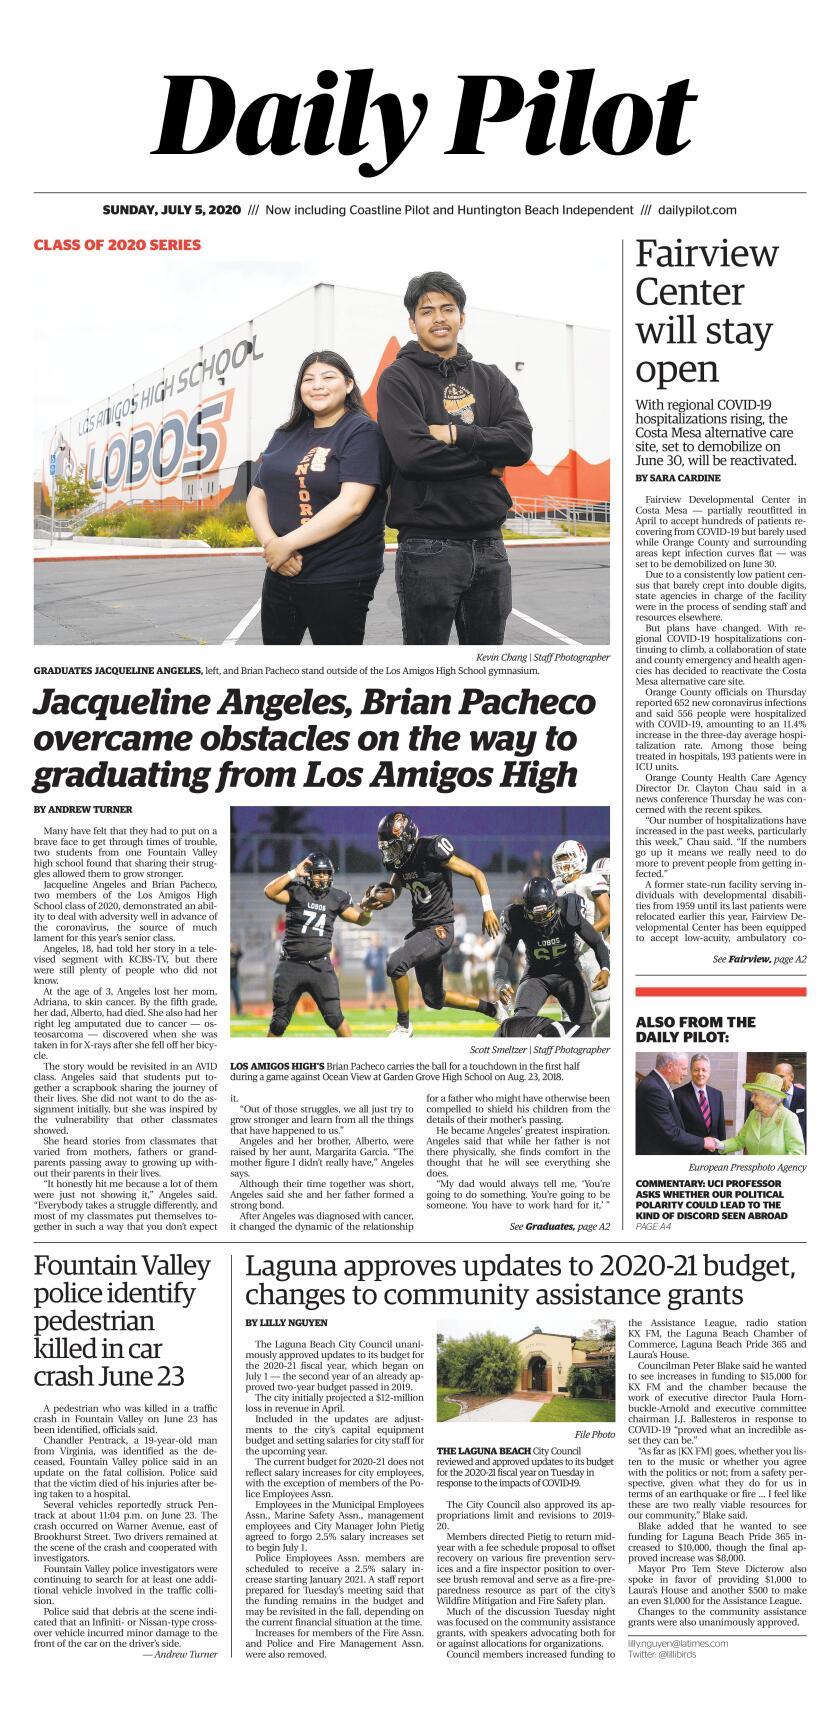 Daily Pilot e-Newspaper: Sunday, July 5, 2020 Cover